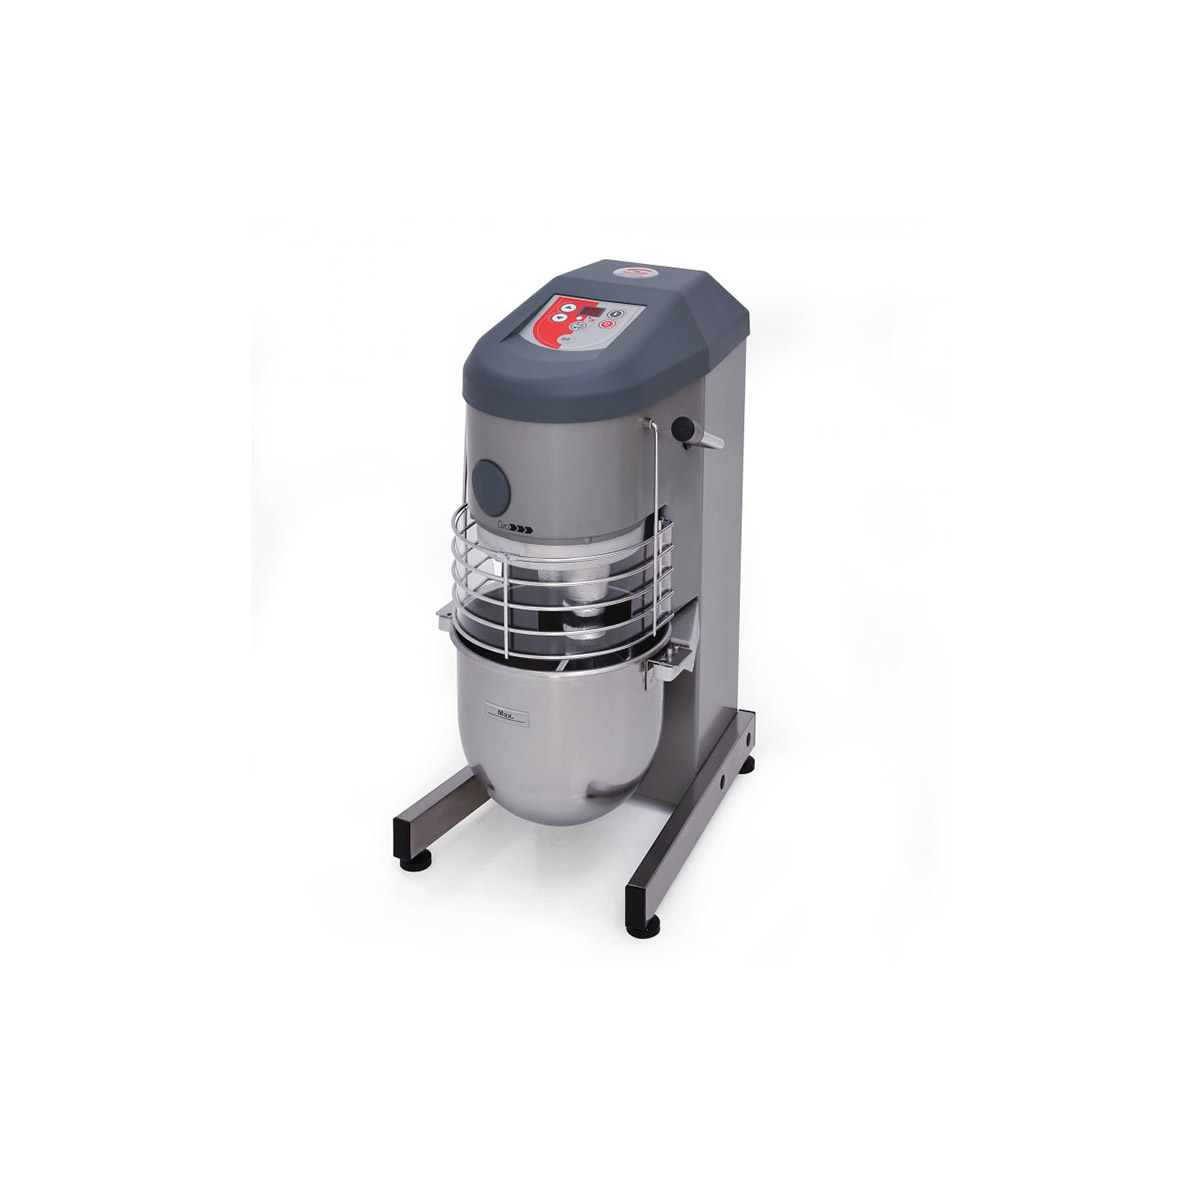 Sammic BE-10 Table Top Food Mixer